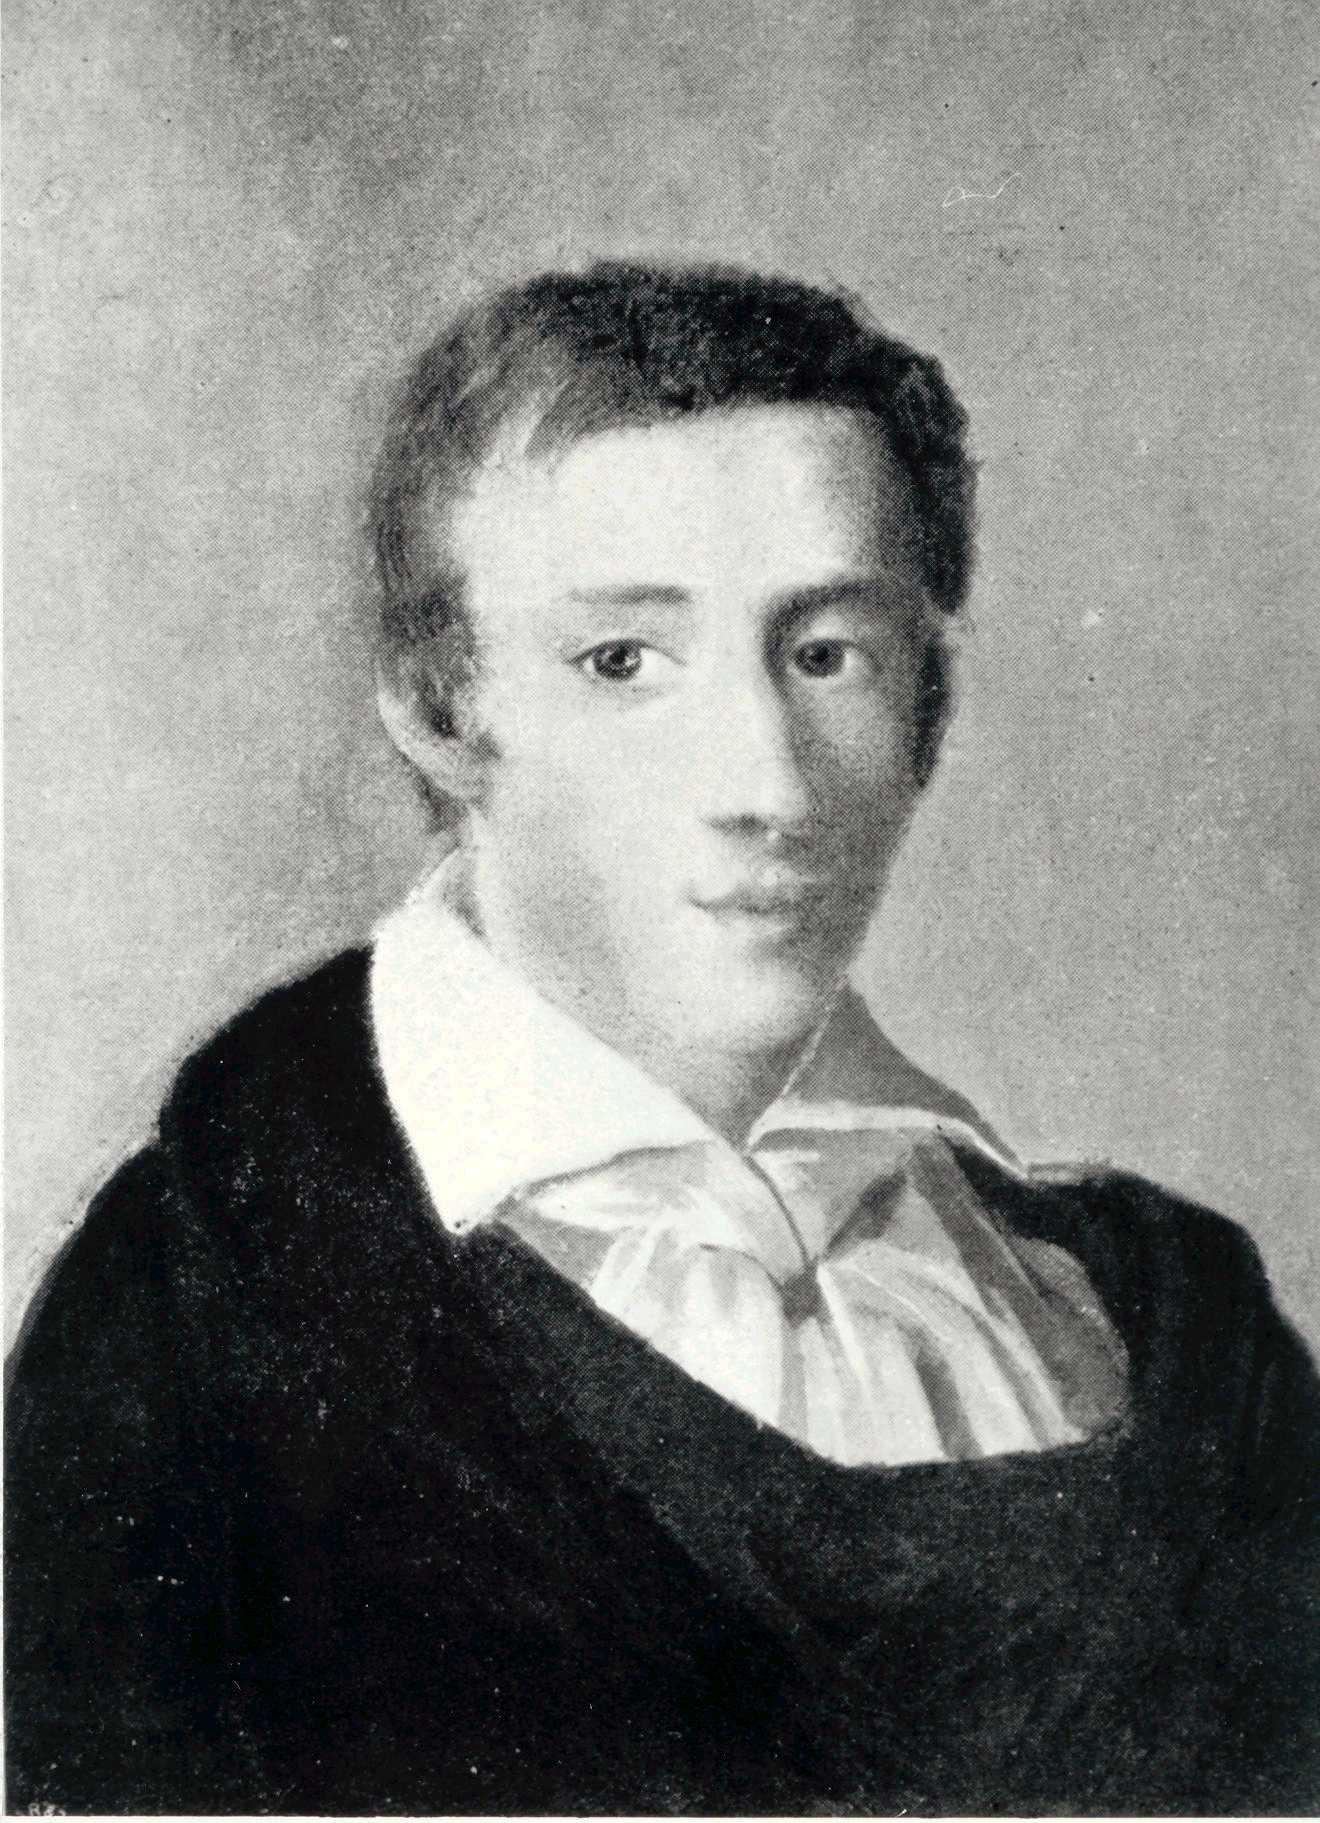 Chopin en 1829, obra de Ambroży Mieroszewski.